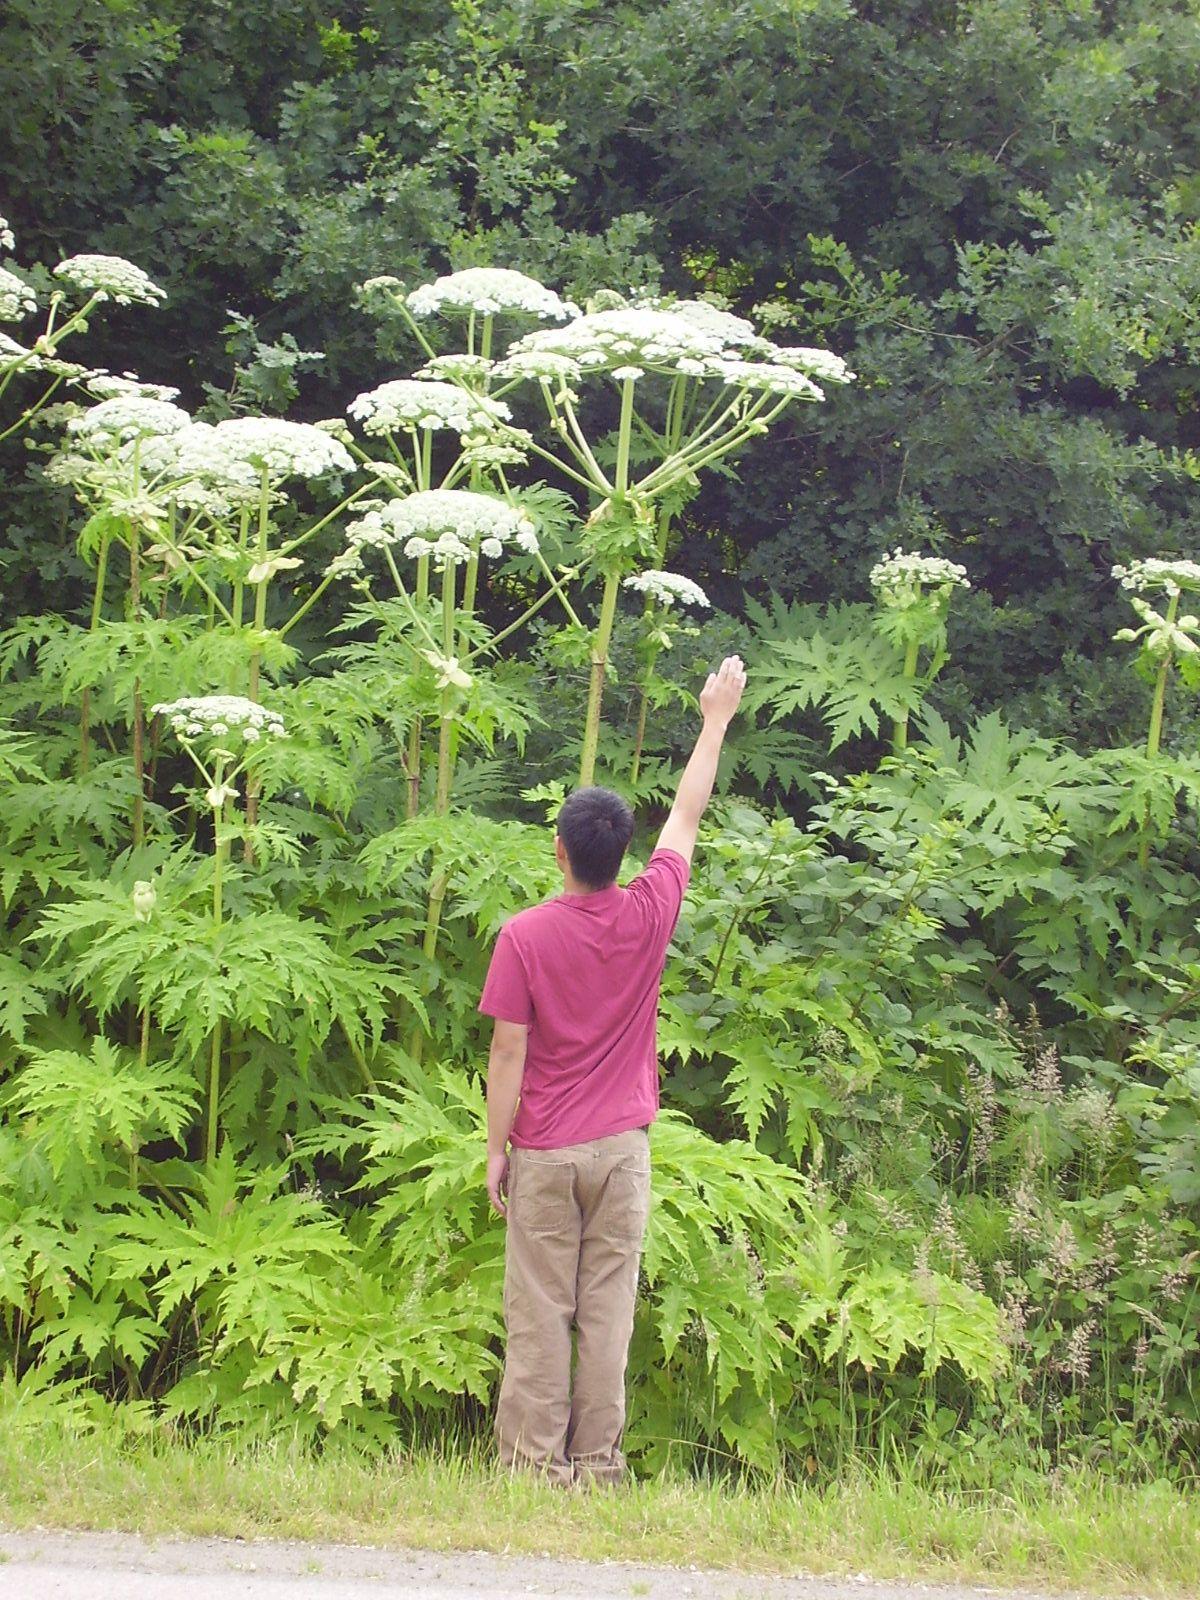 Giant hogweed Giant Hogweed. Very dangerous. Please